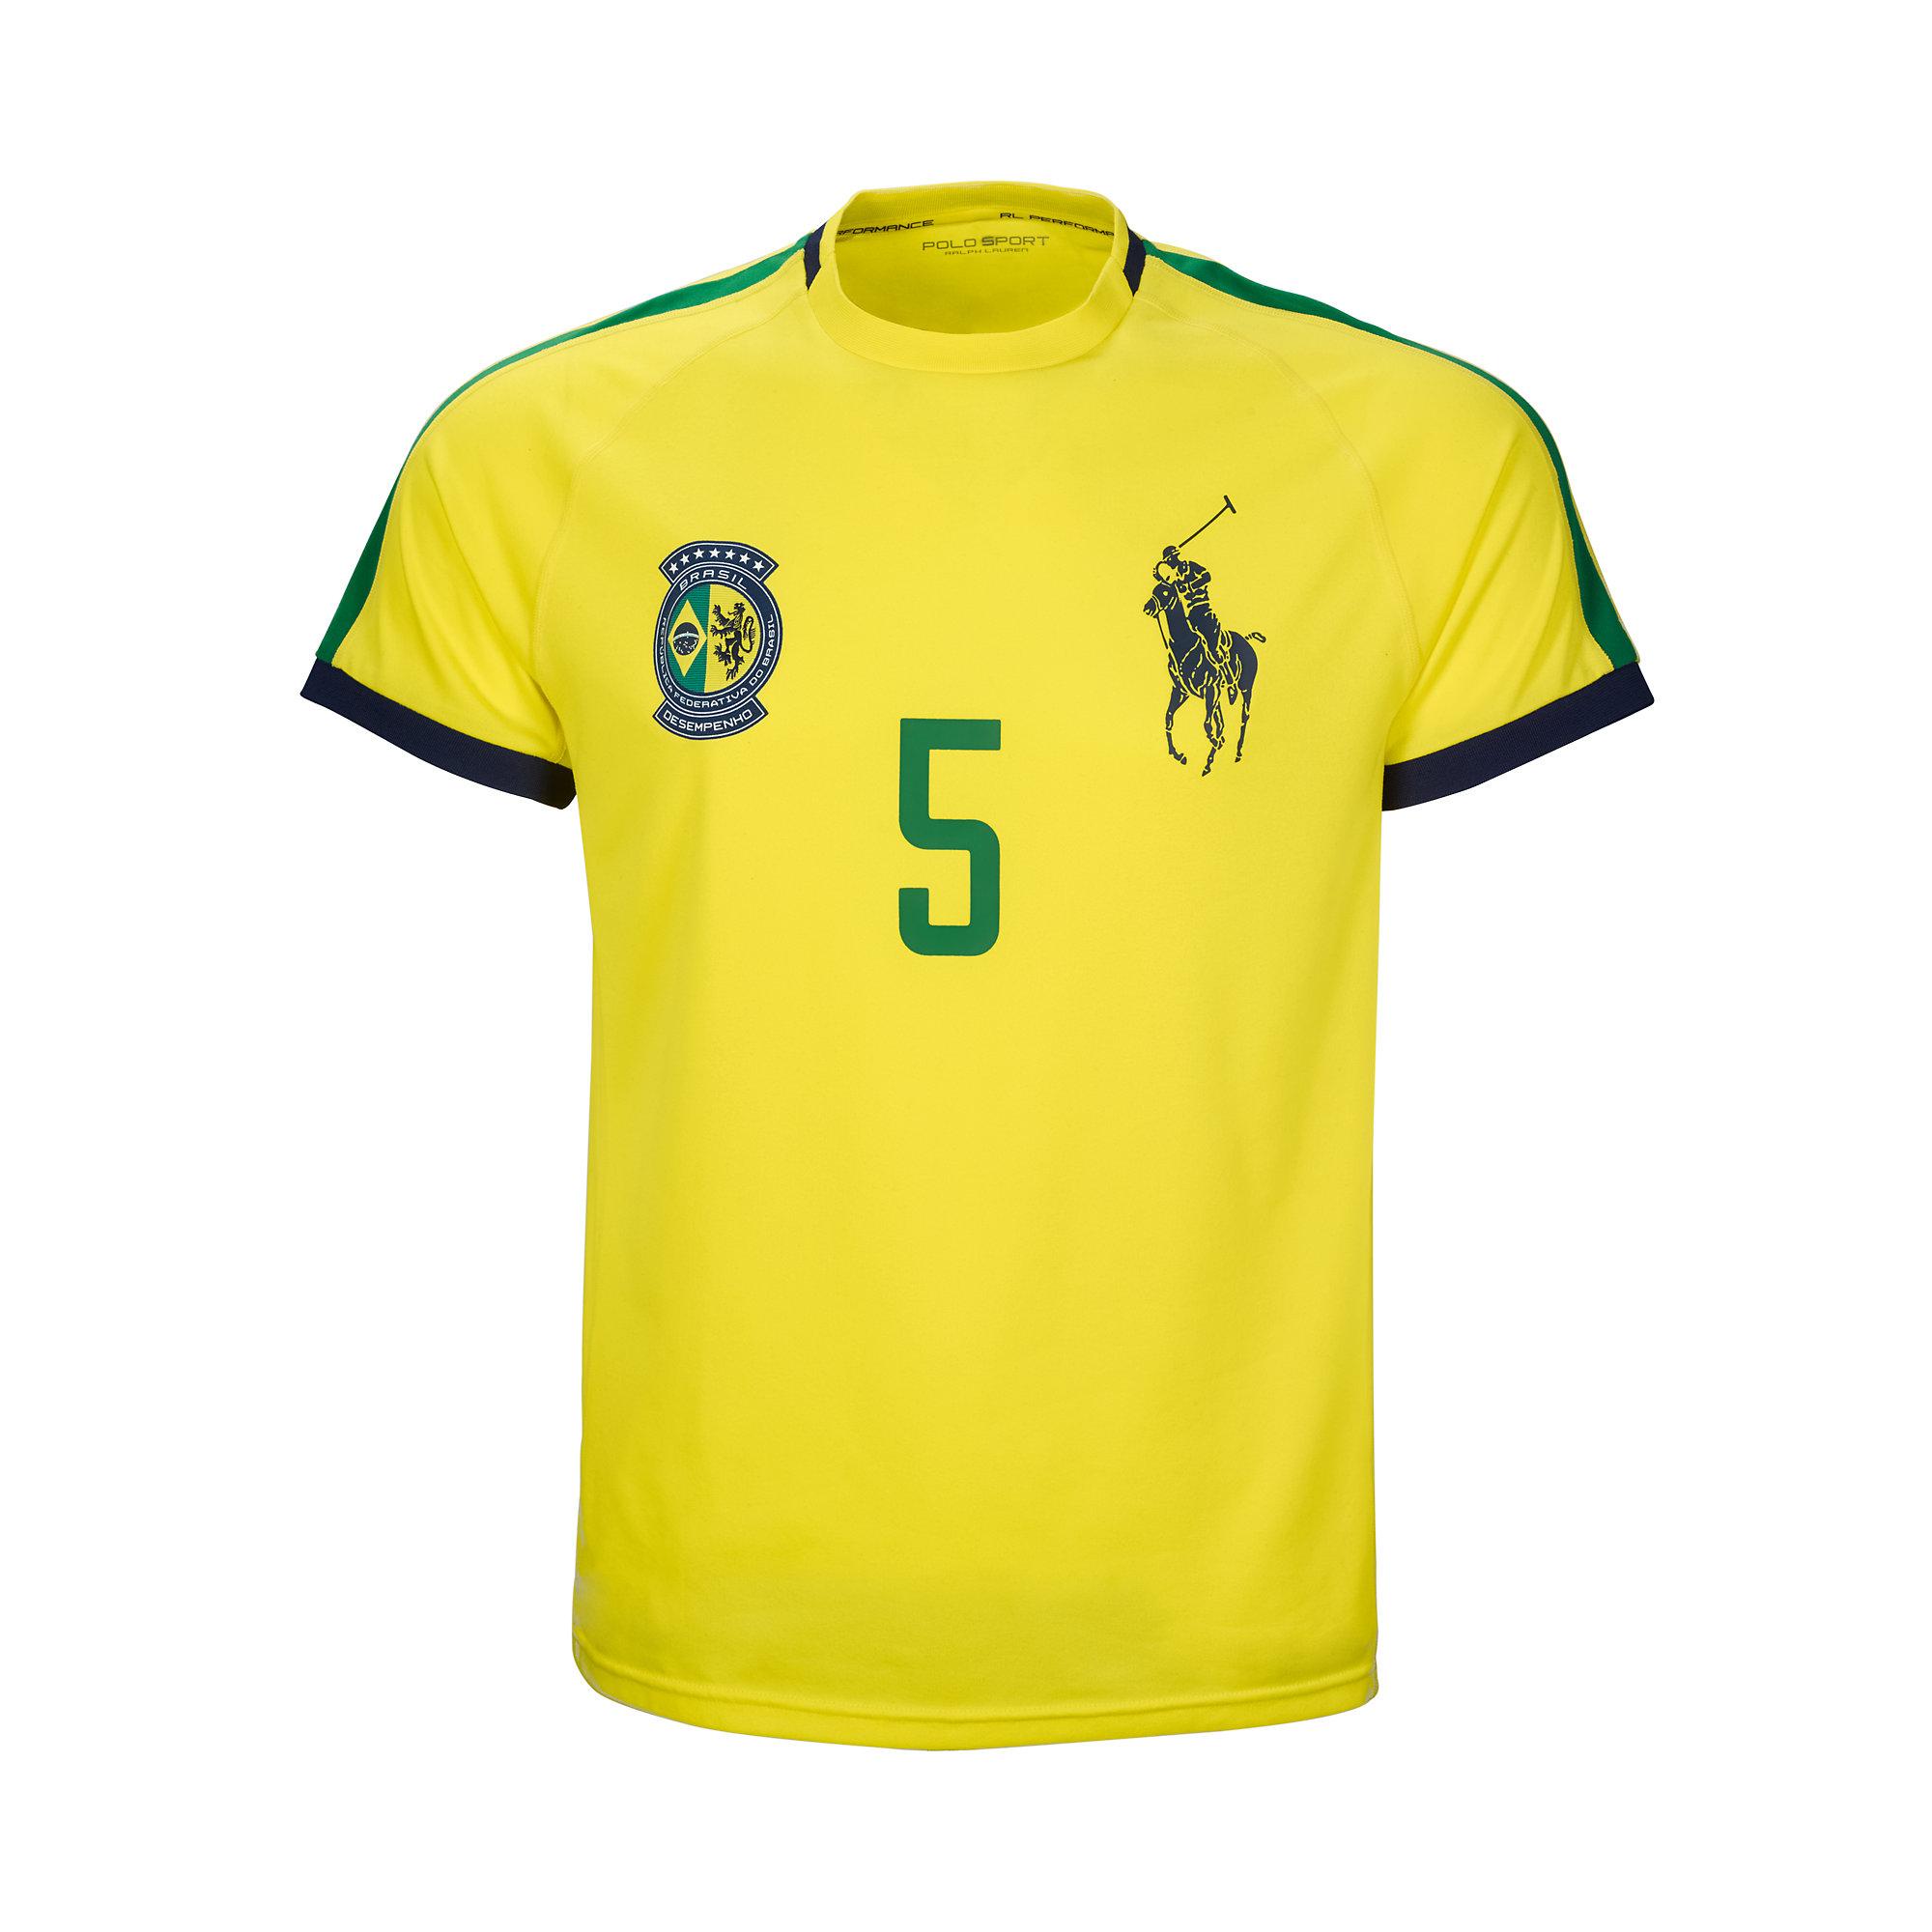 lyst ralph lauren brazil jersey t shirt in yellow for men. Black Bedroom Furniture Sets. Home Design Ideas